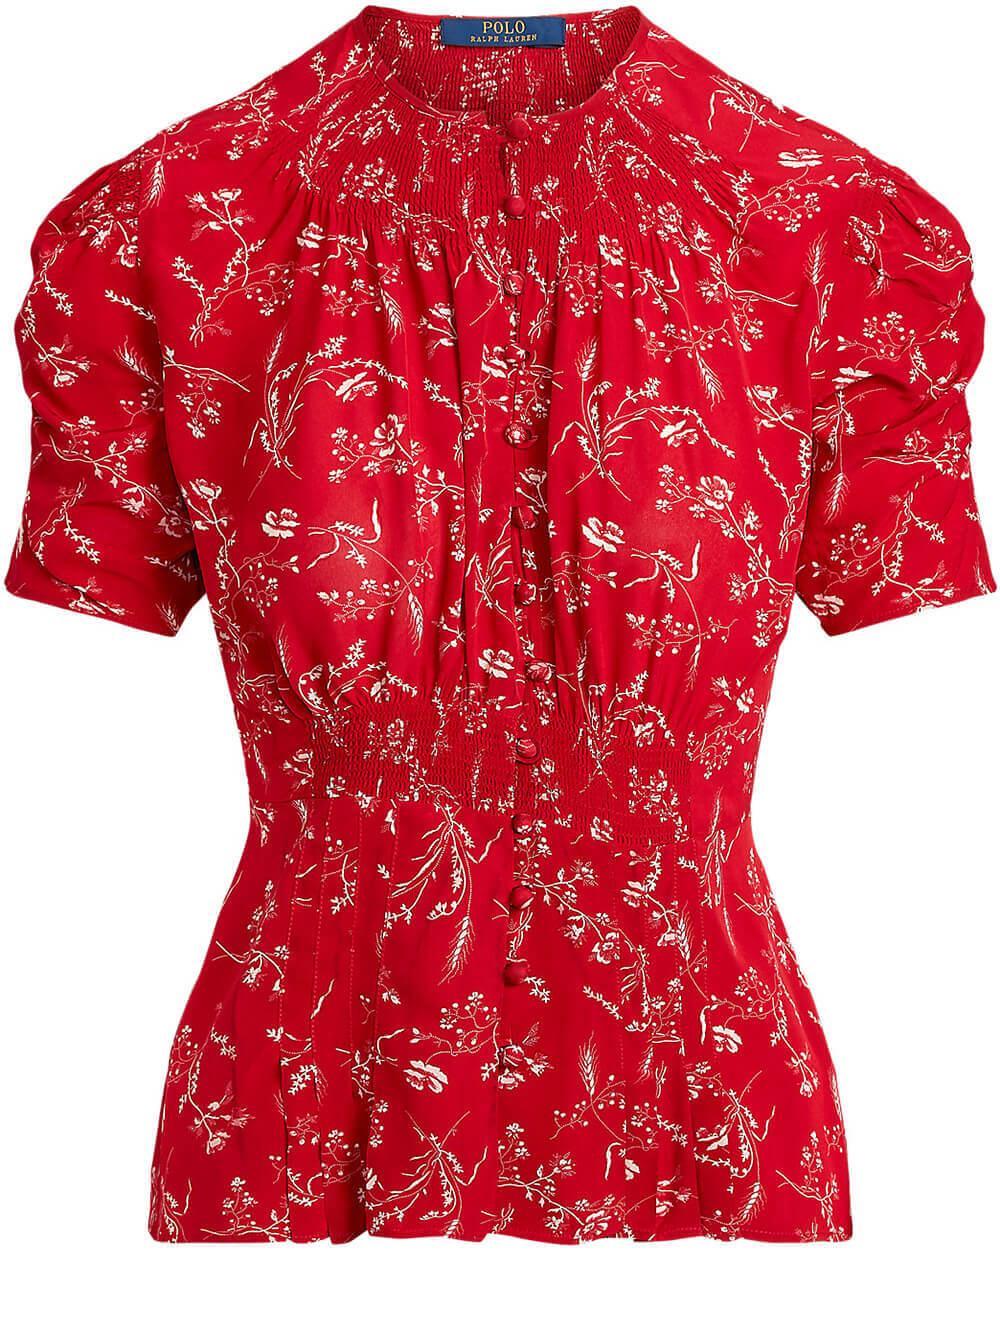 Floral Crepe Blouse Item # 211792729002